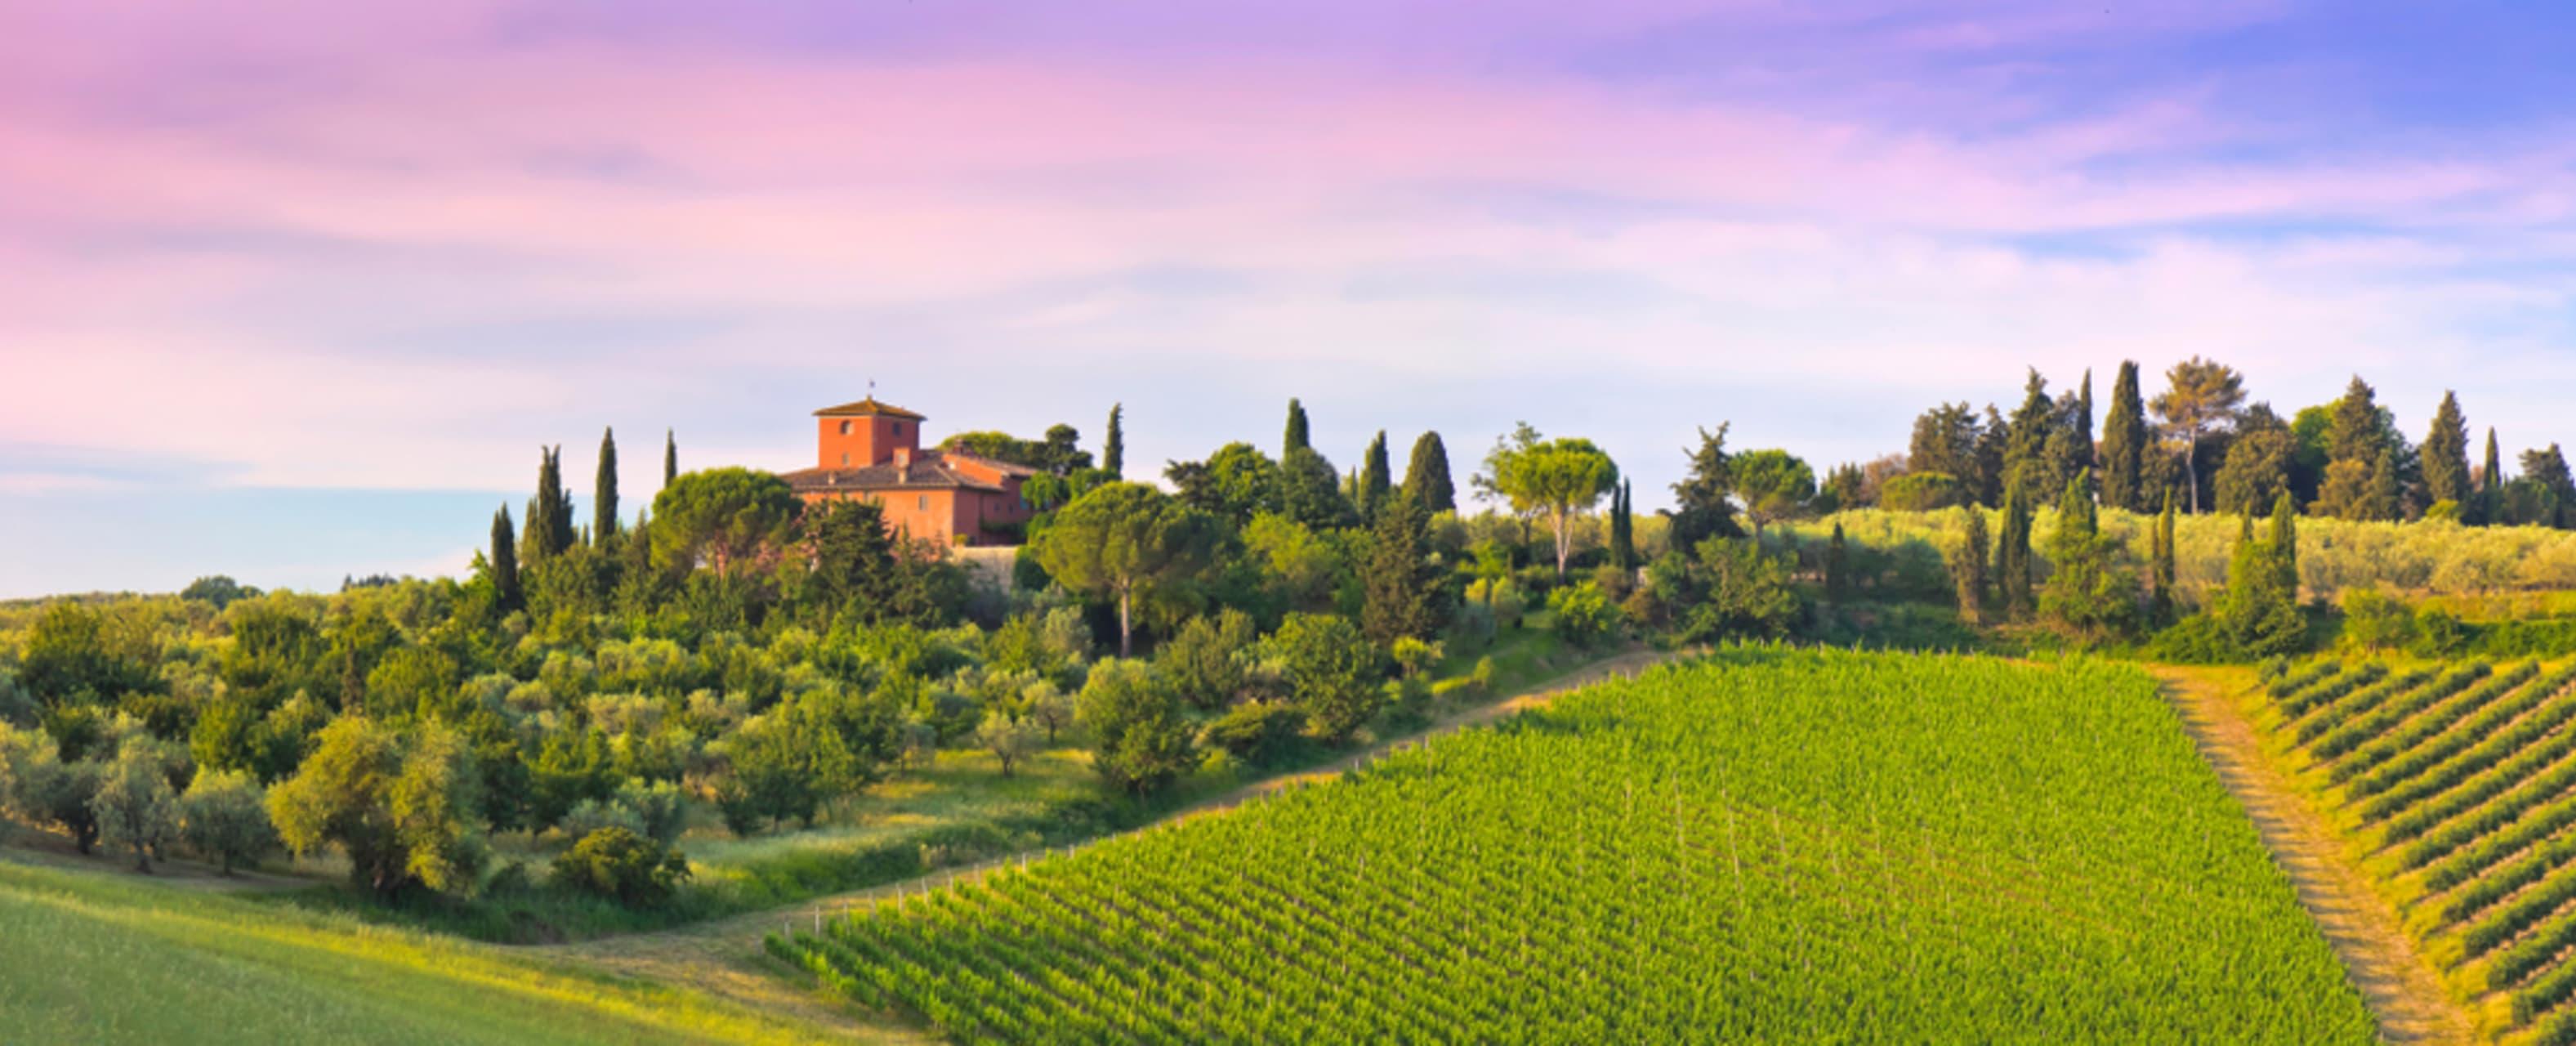 Tuscany cover image